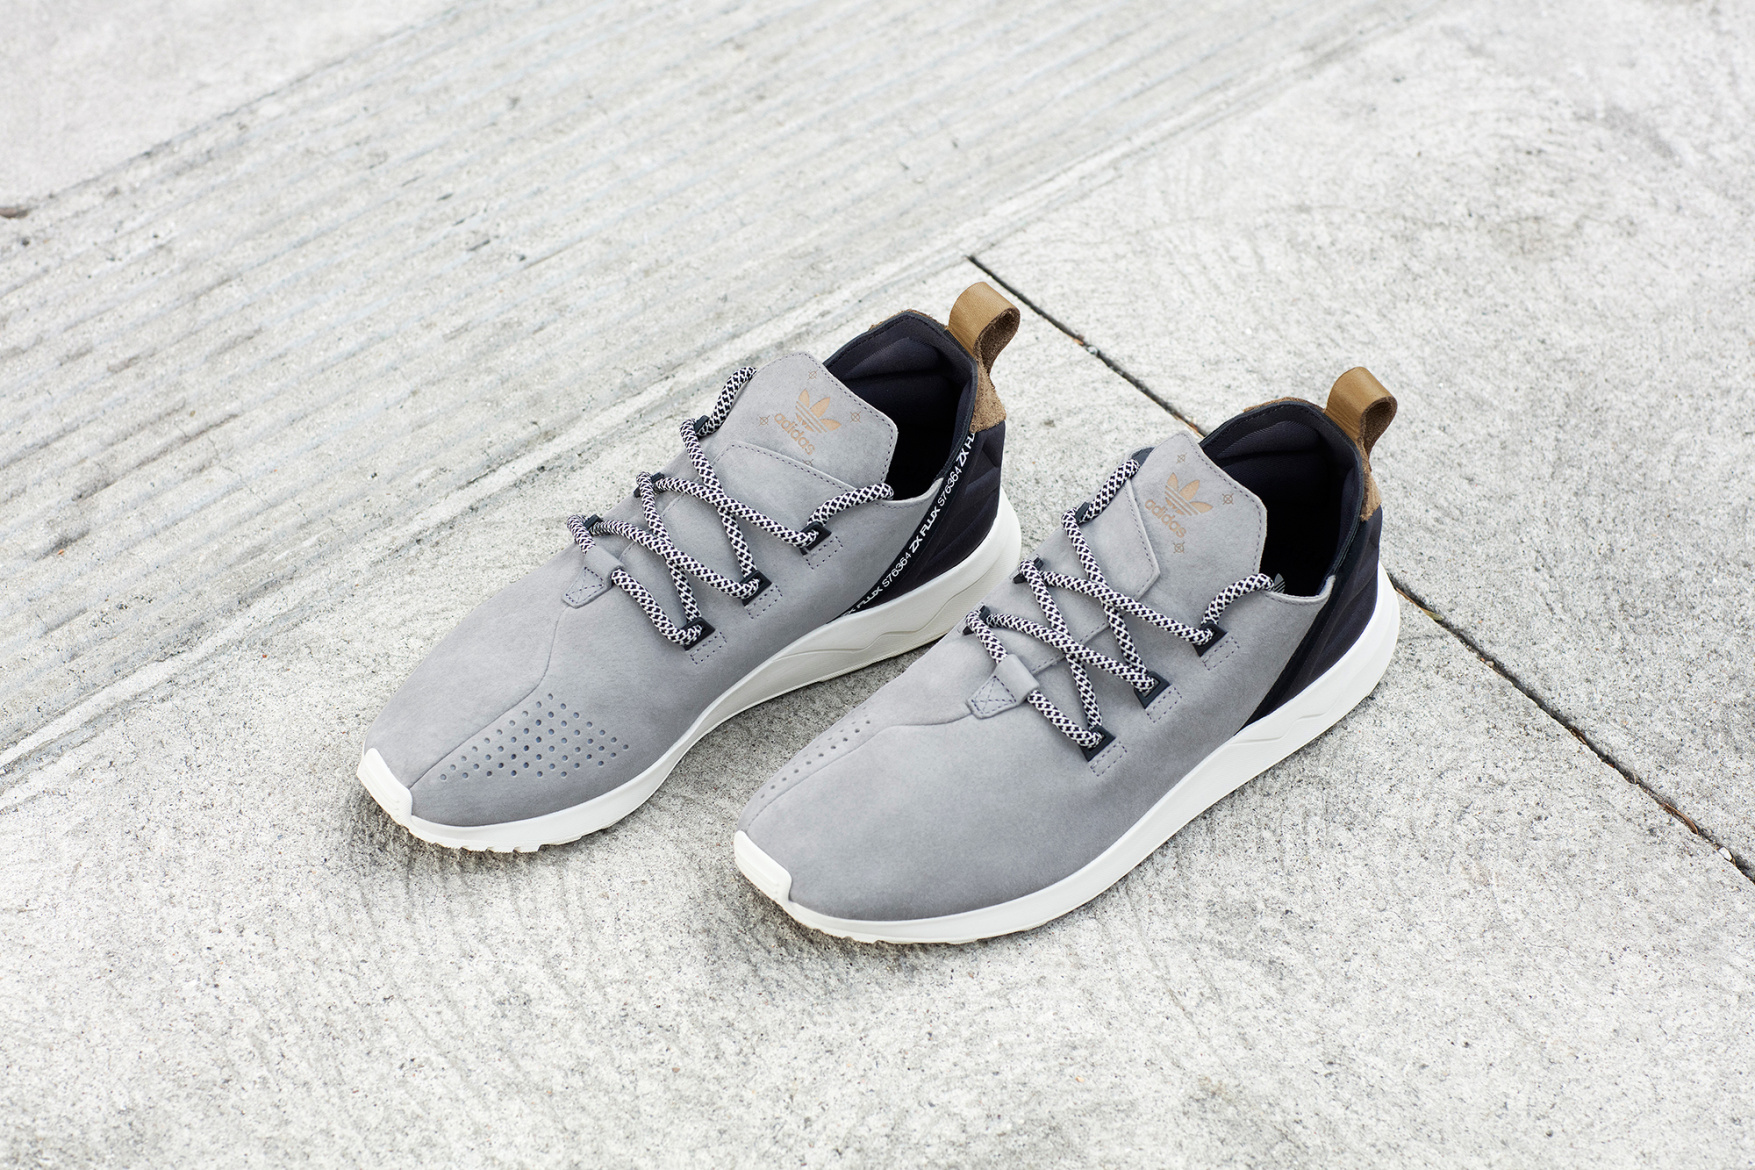 adidas-zx-flux-adv-x-suede-01